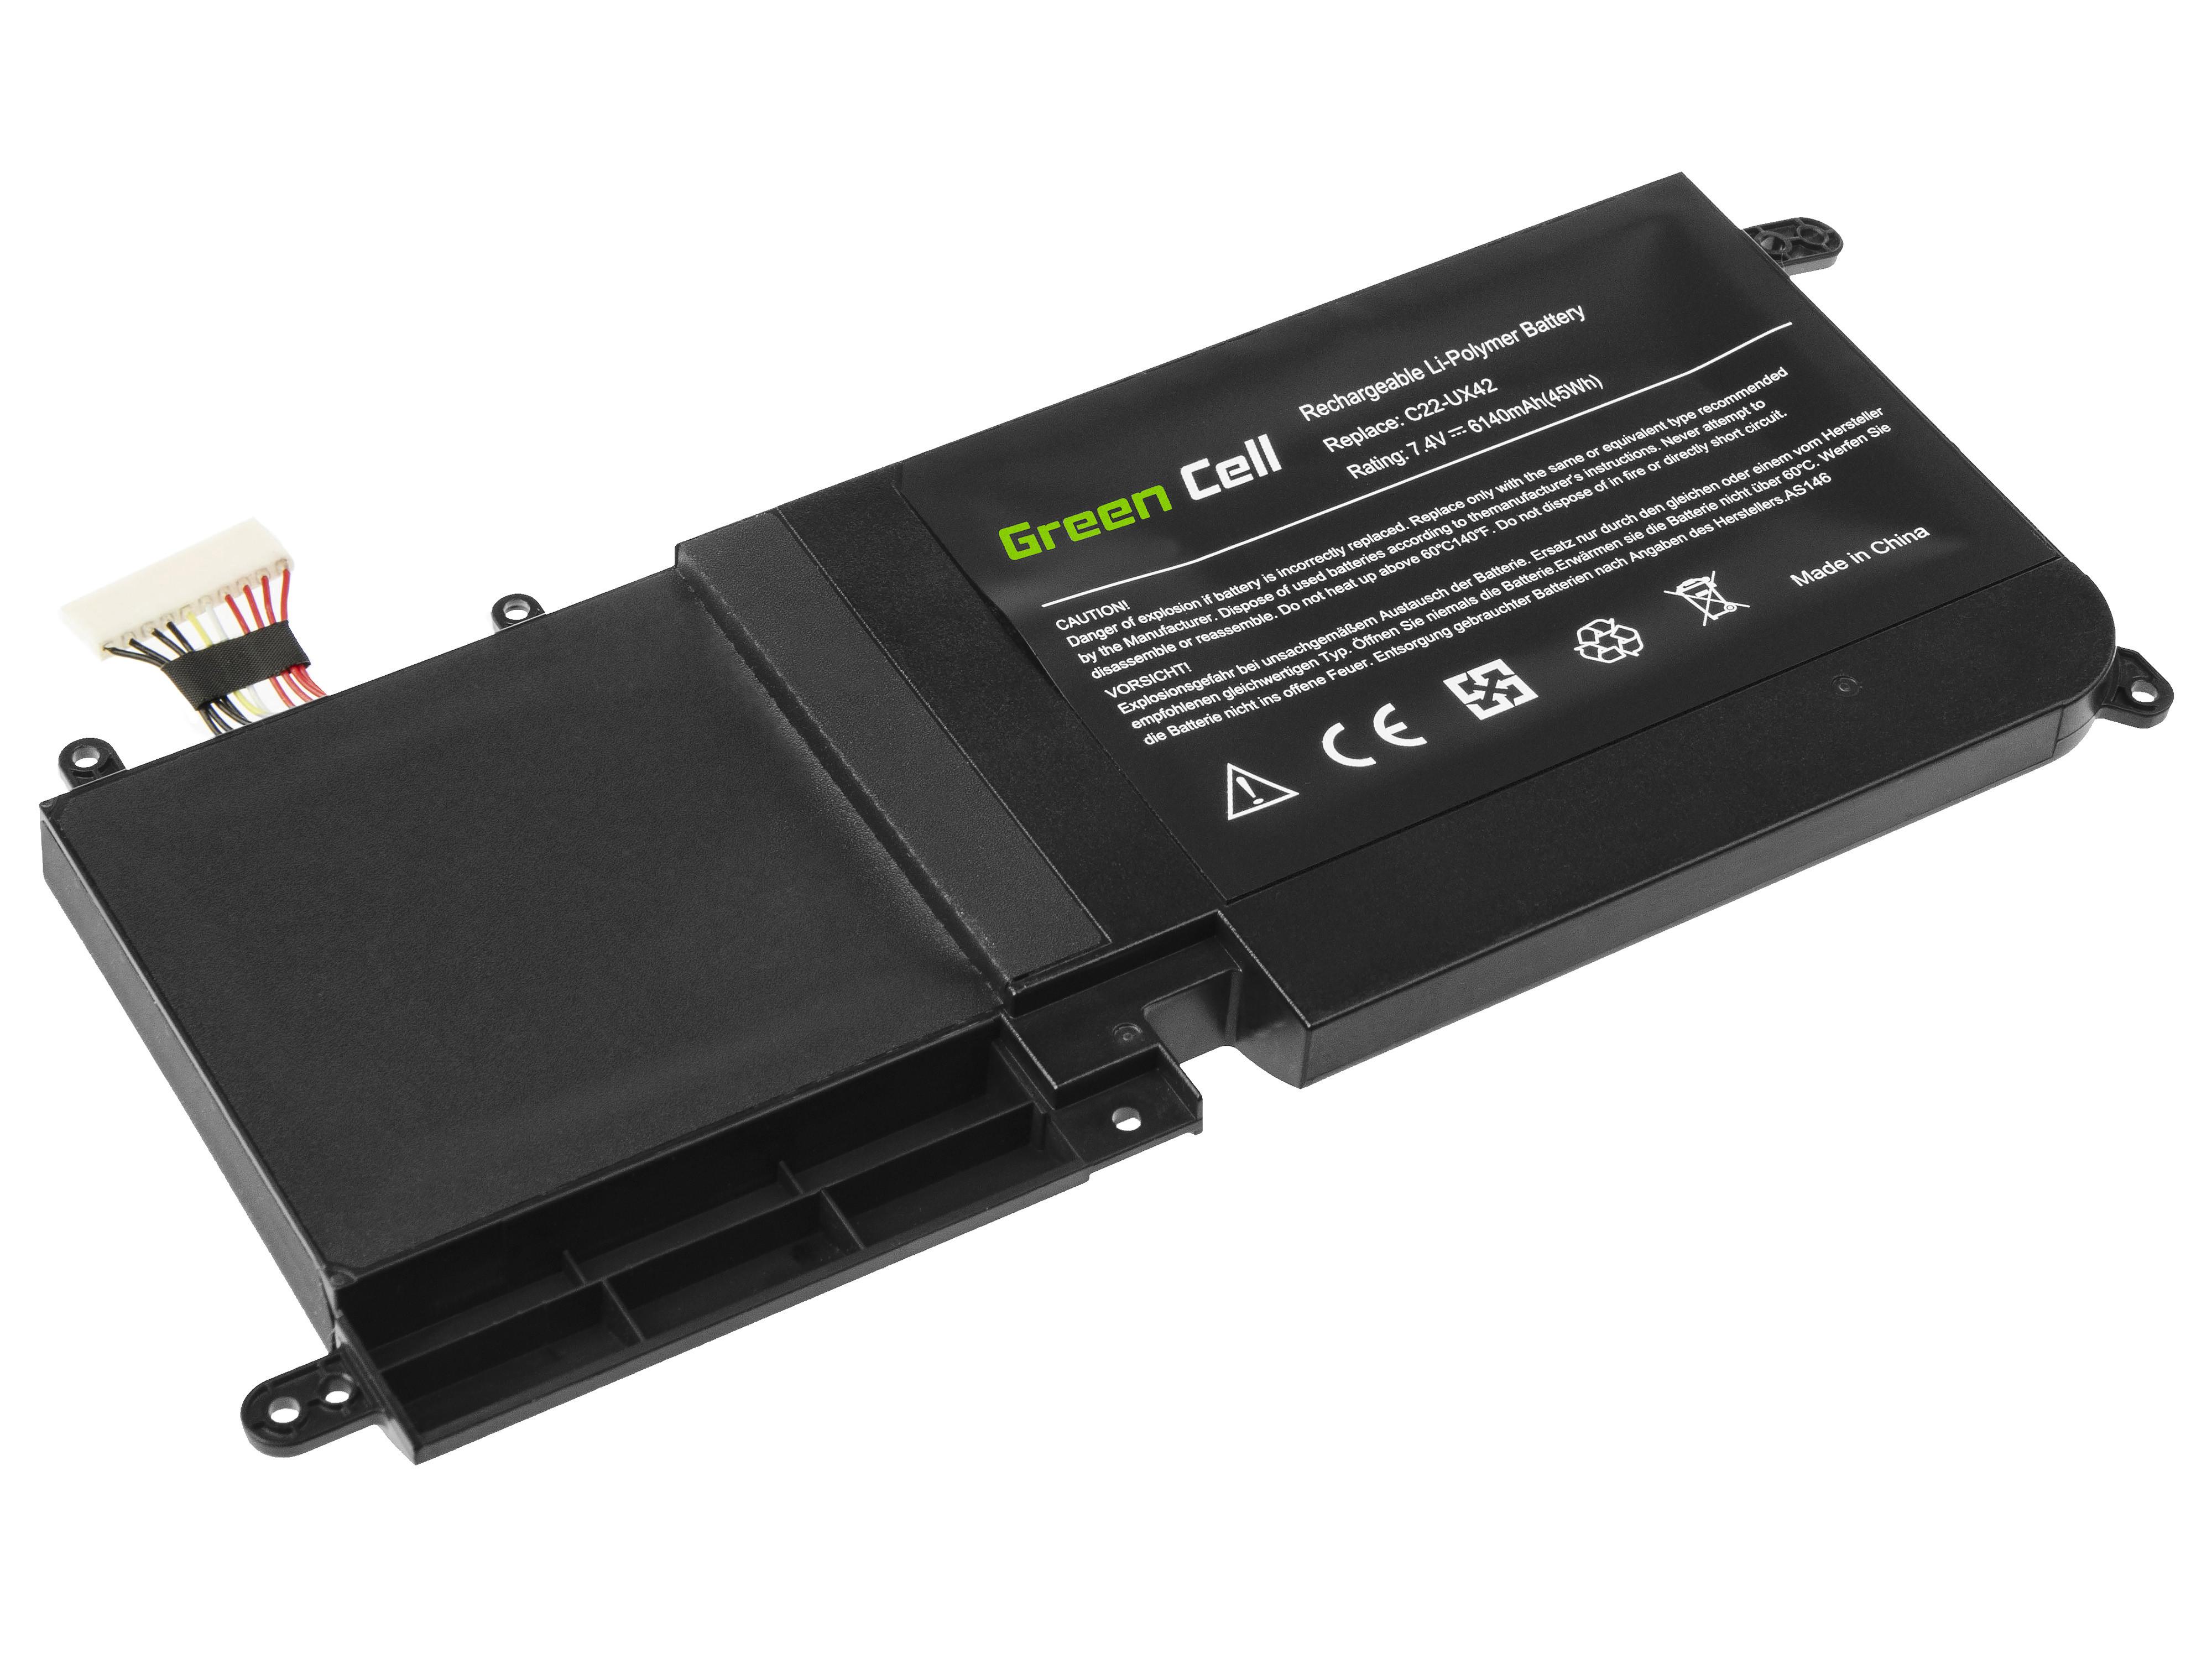 Green Cell AS146 Baterie Asus C22-UX42,Asus ZenBook UX42 UX42V UX42VS 6140mAh Li-Pol – neoriginální